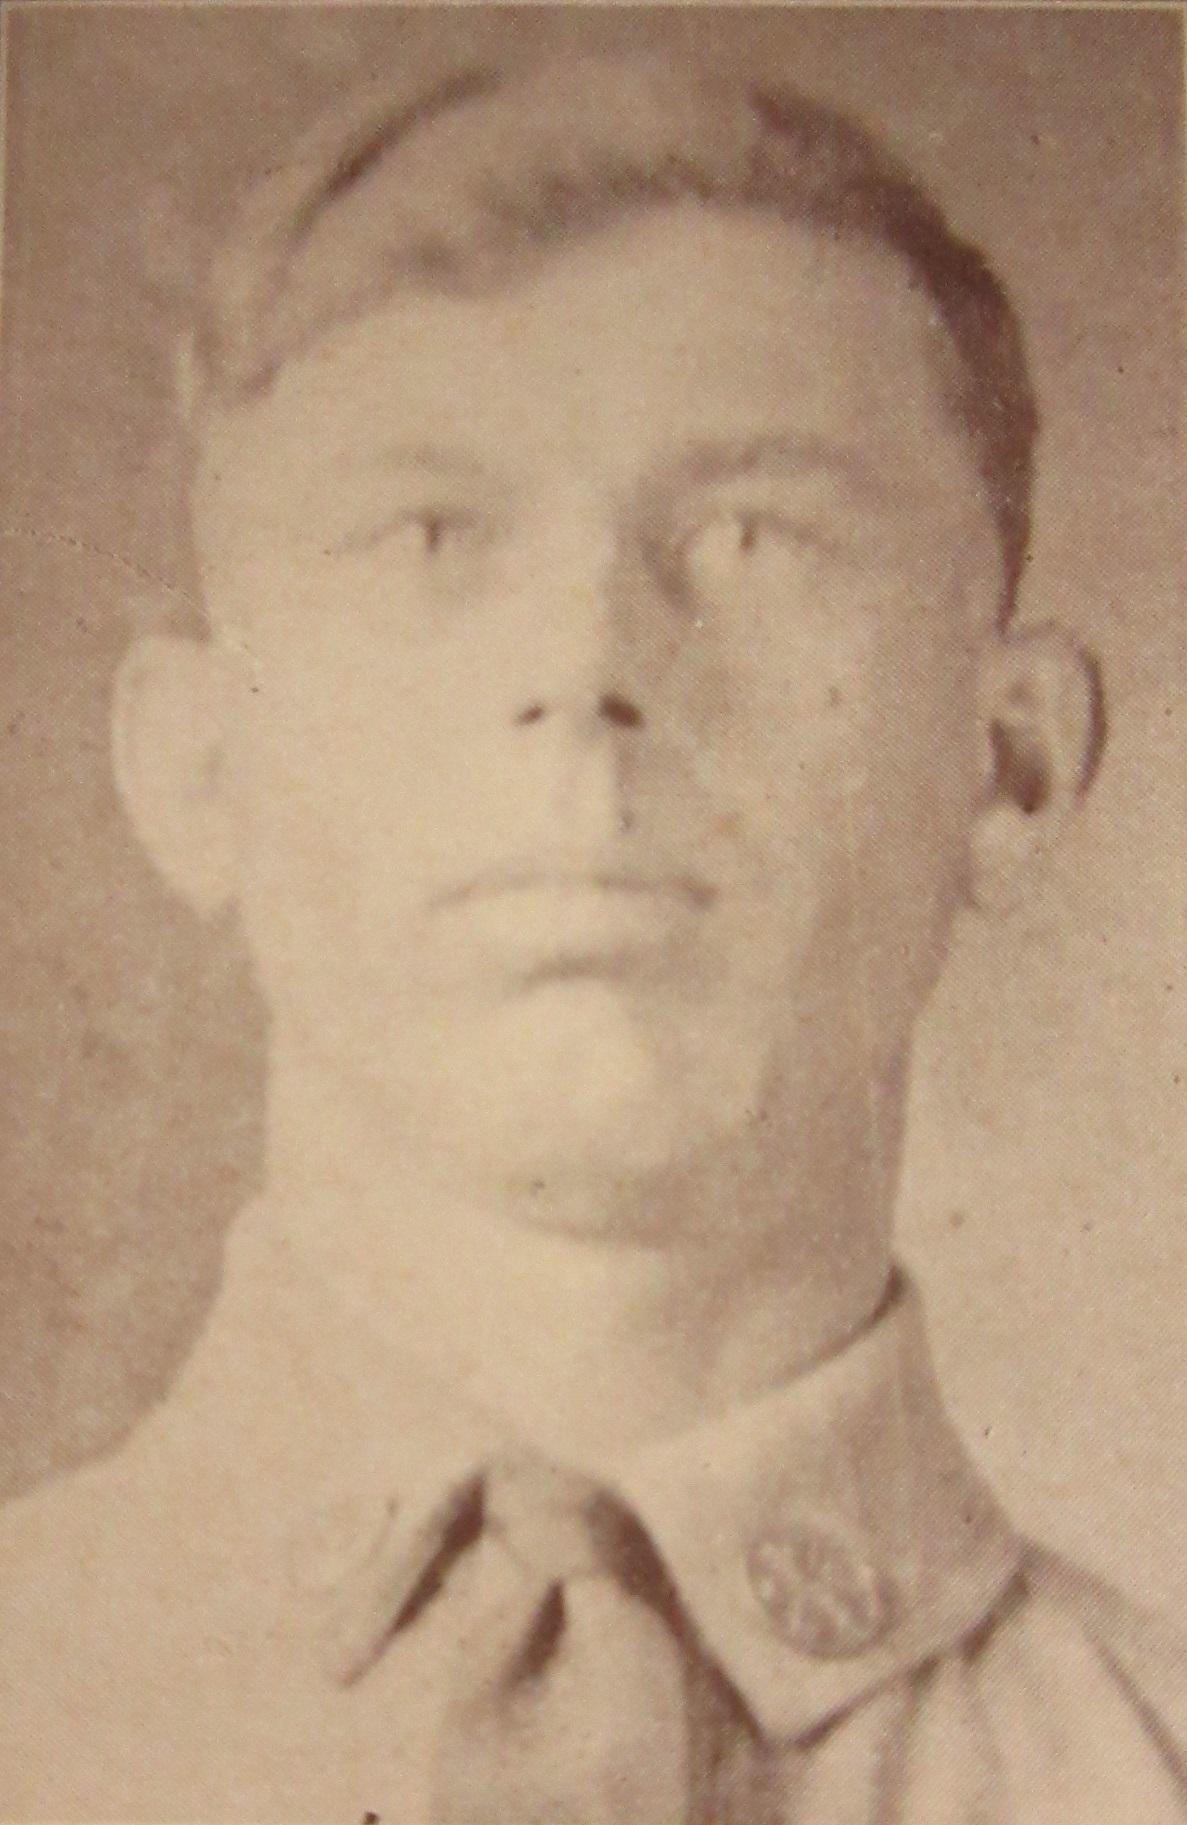 William Scarberry